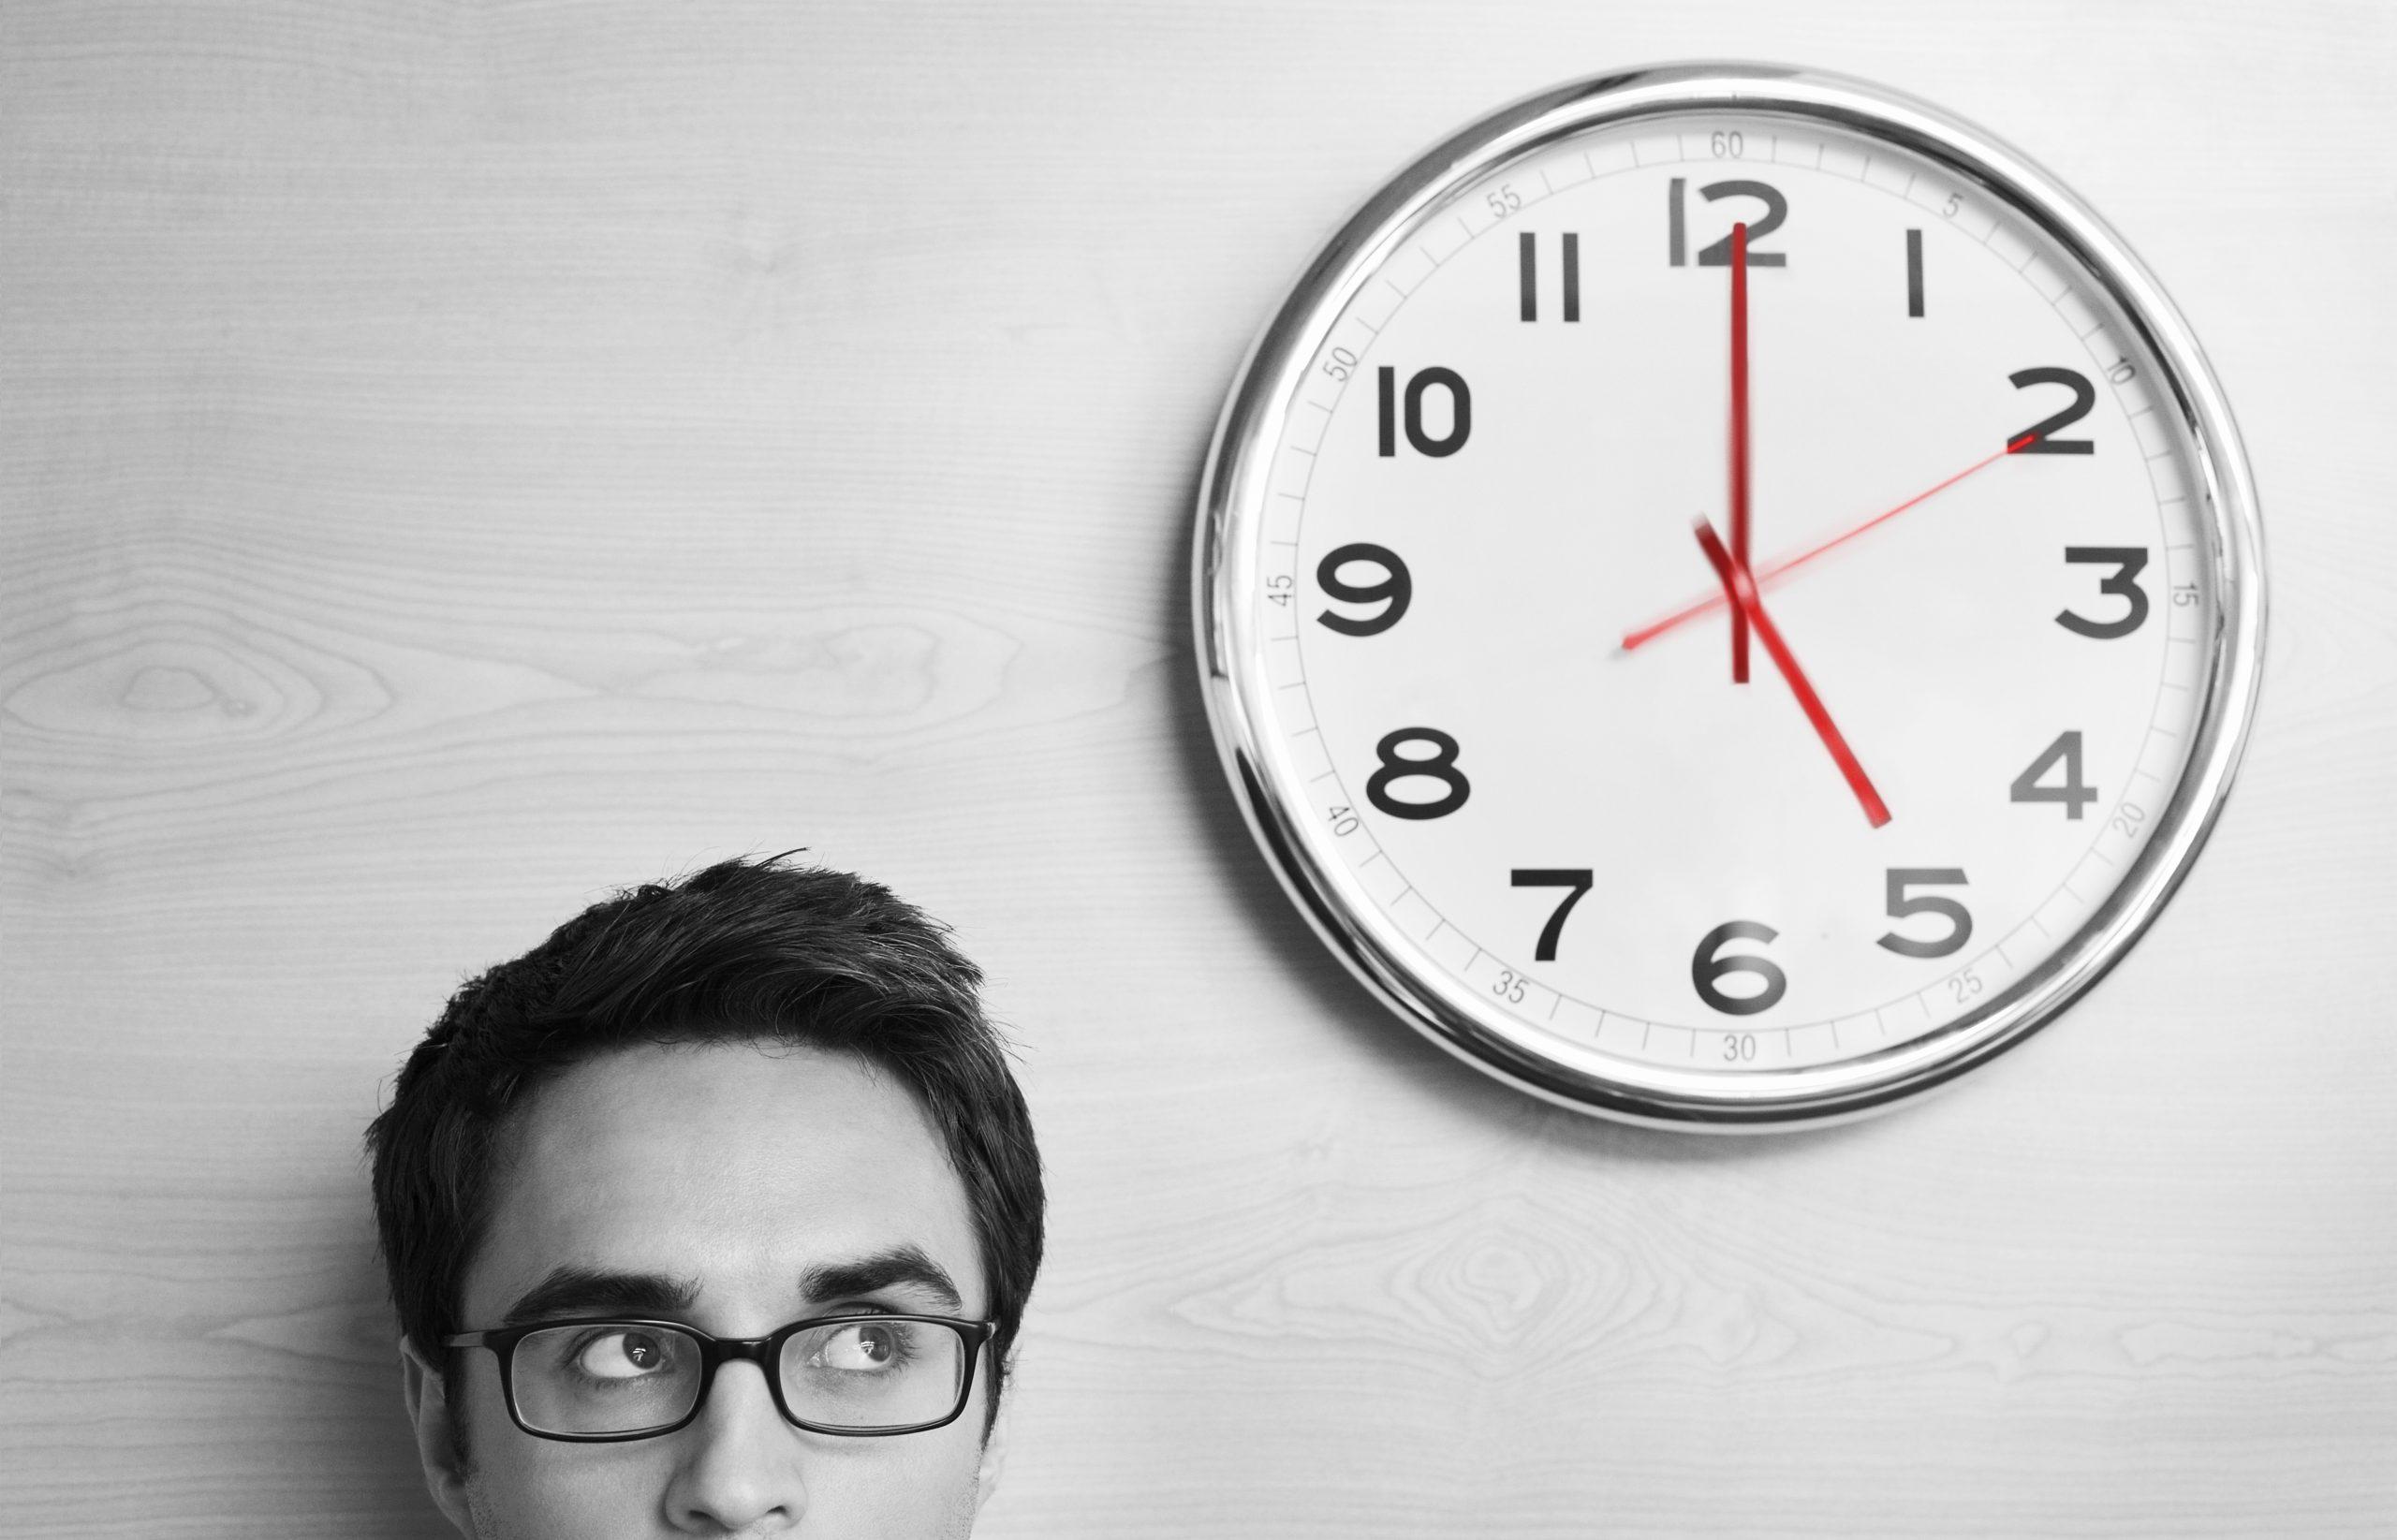 👉5 Types of Procrastinators